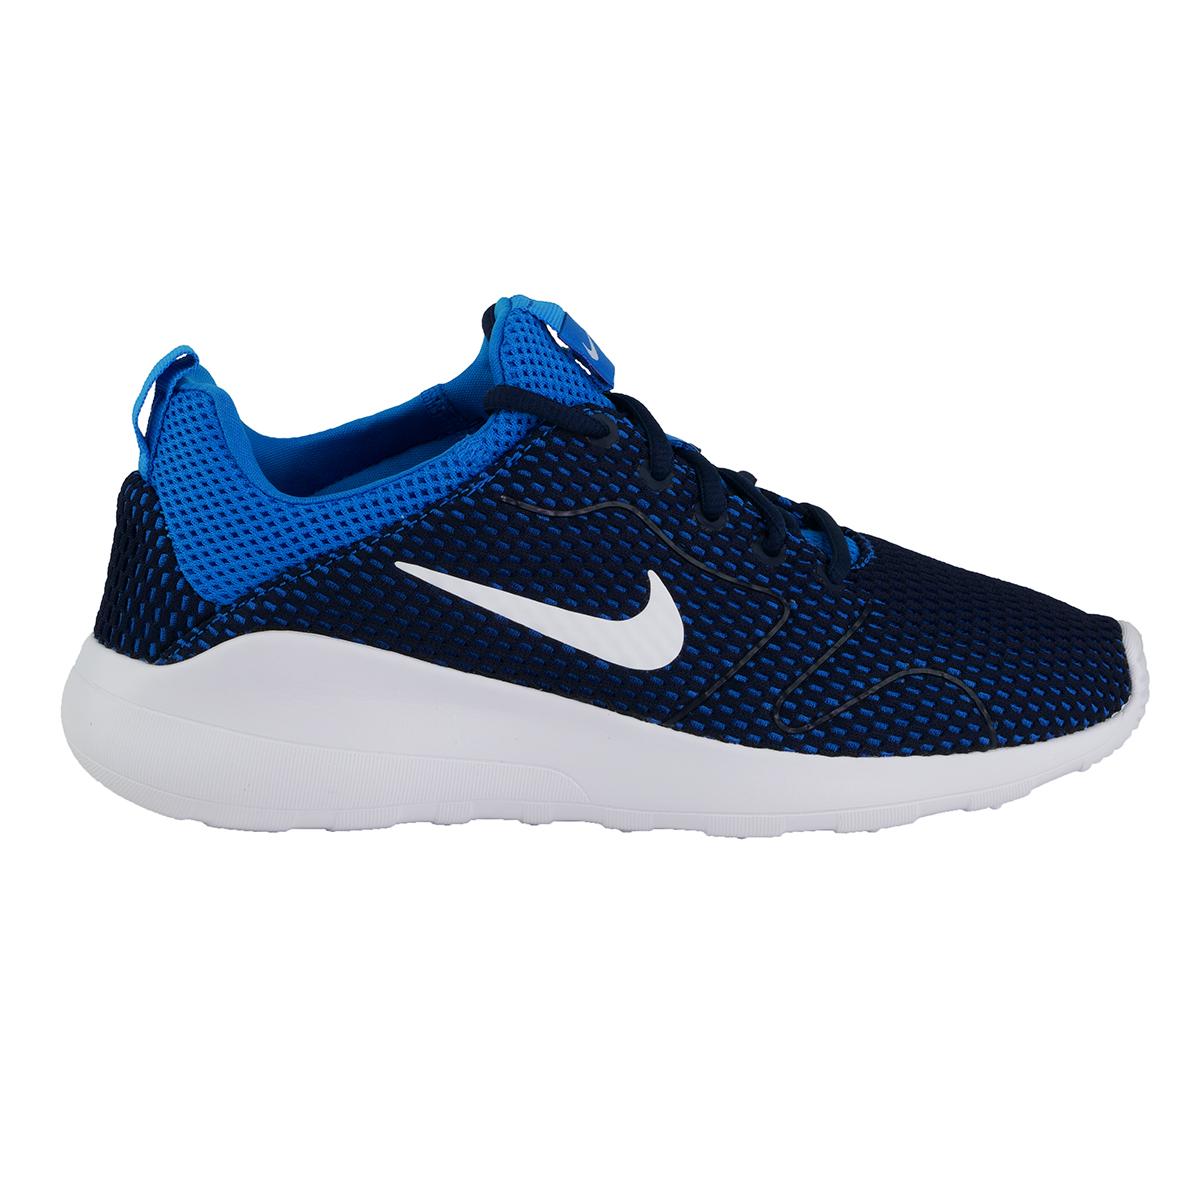 Nike Men's Kaishi 2.0 SE Running Shoes | eBay